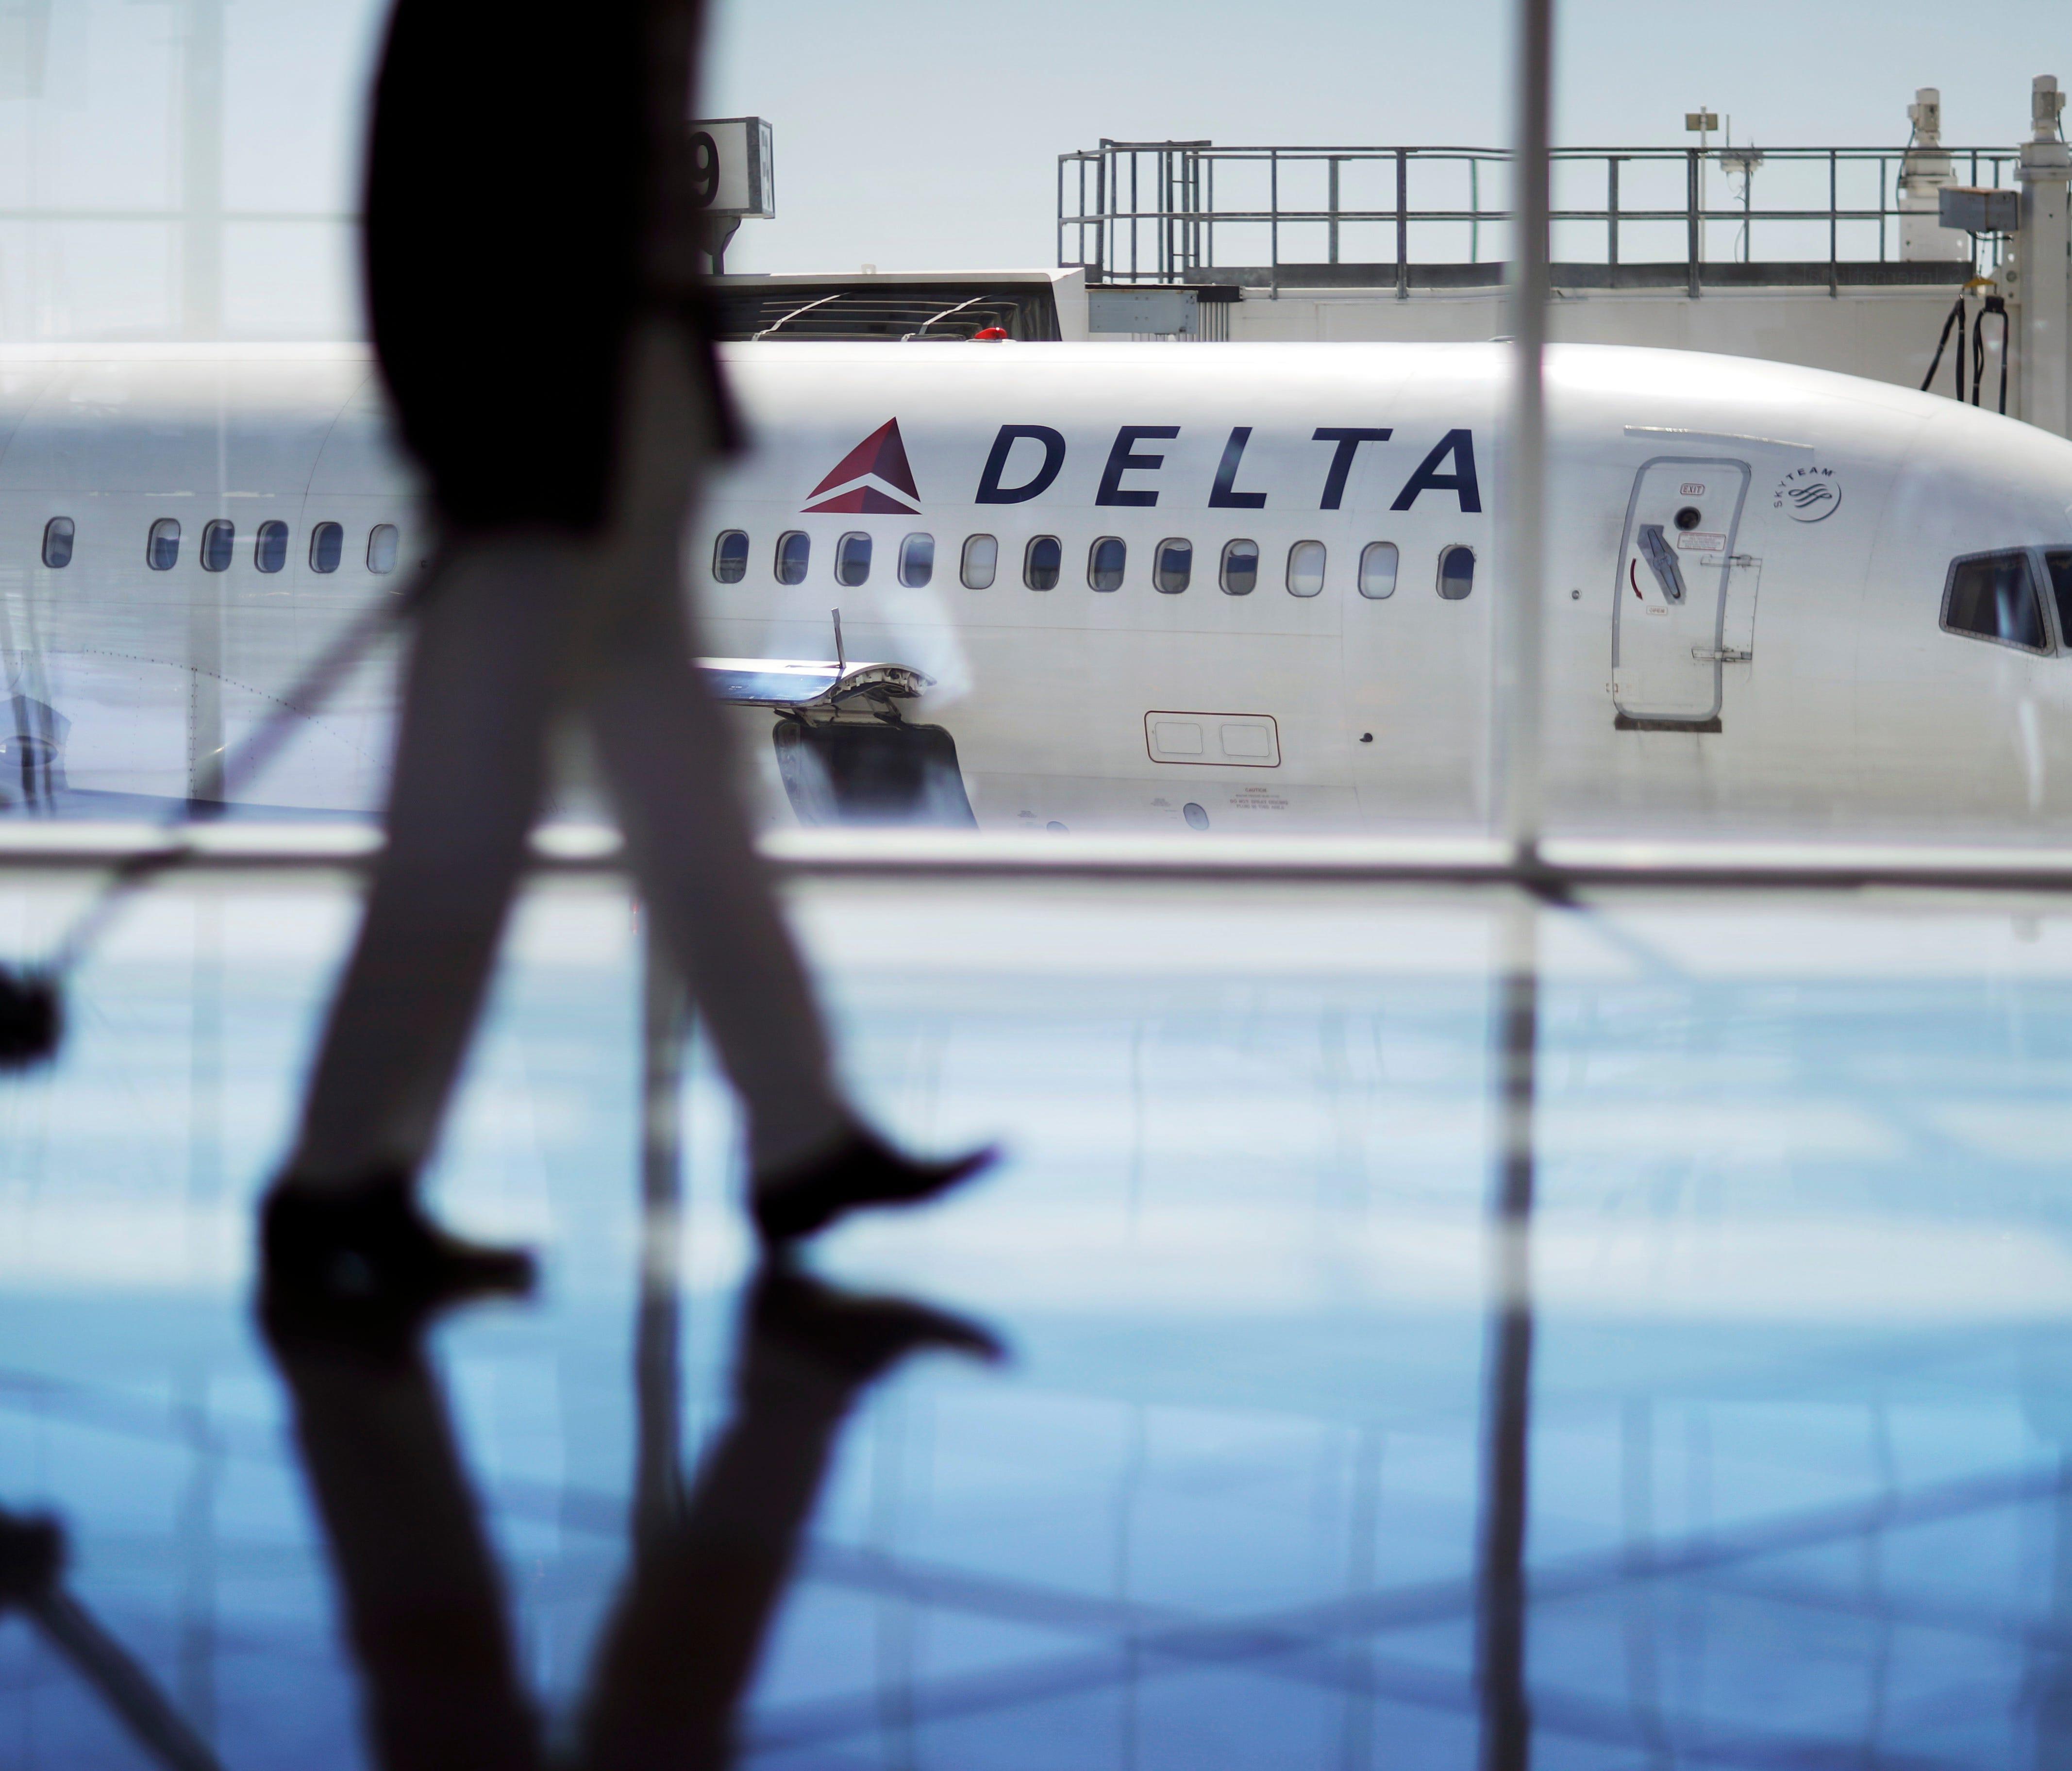 A man walks past a Delta Air Lines jet Oct. 13, 2016, at Hartsfield-Jackson Atlanta International Airport in Atlanta.